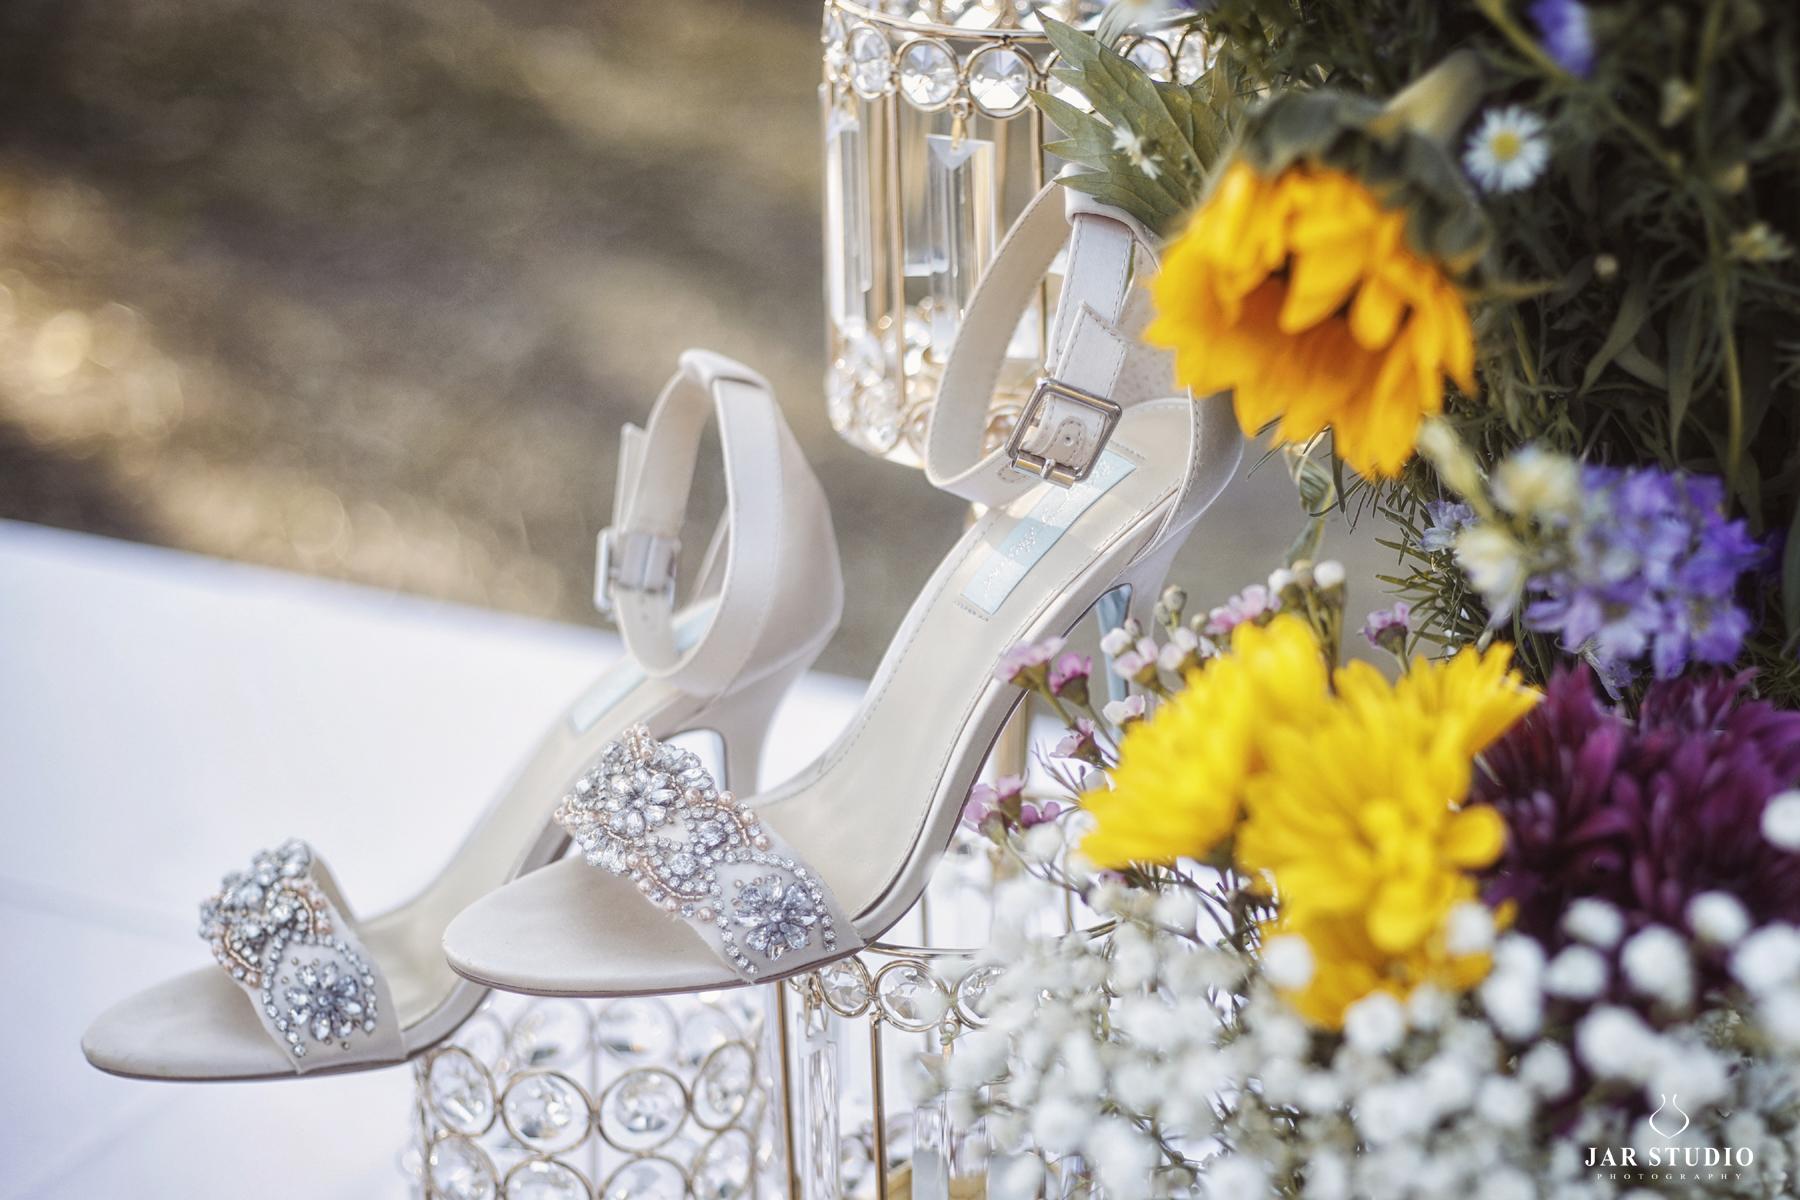 02-bright-decoration-colorful-wedding-day-jarstudio.JPG